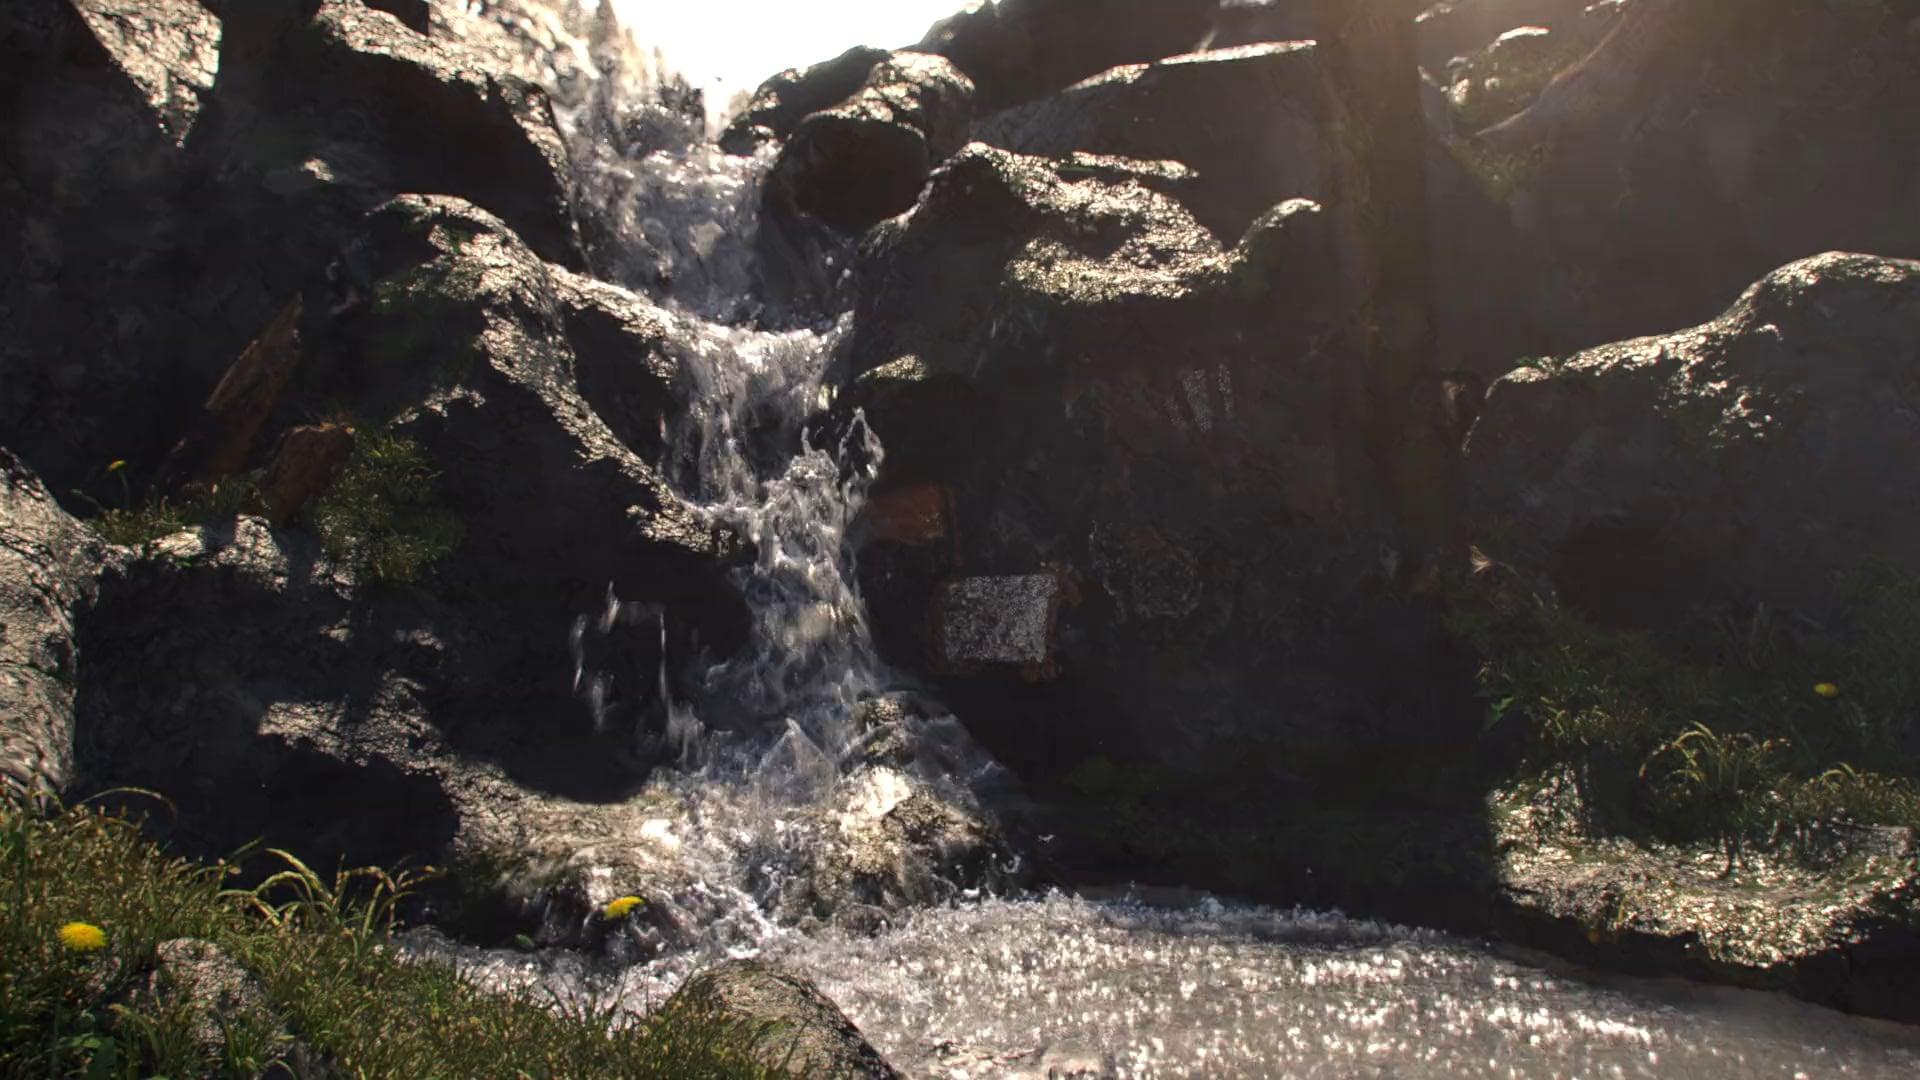 Waterfall - Houdini, Renderman, Nuke